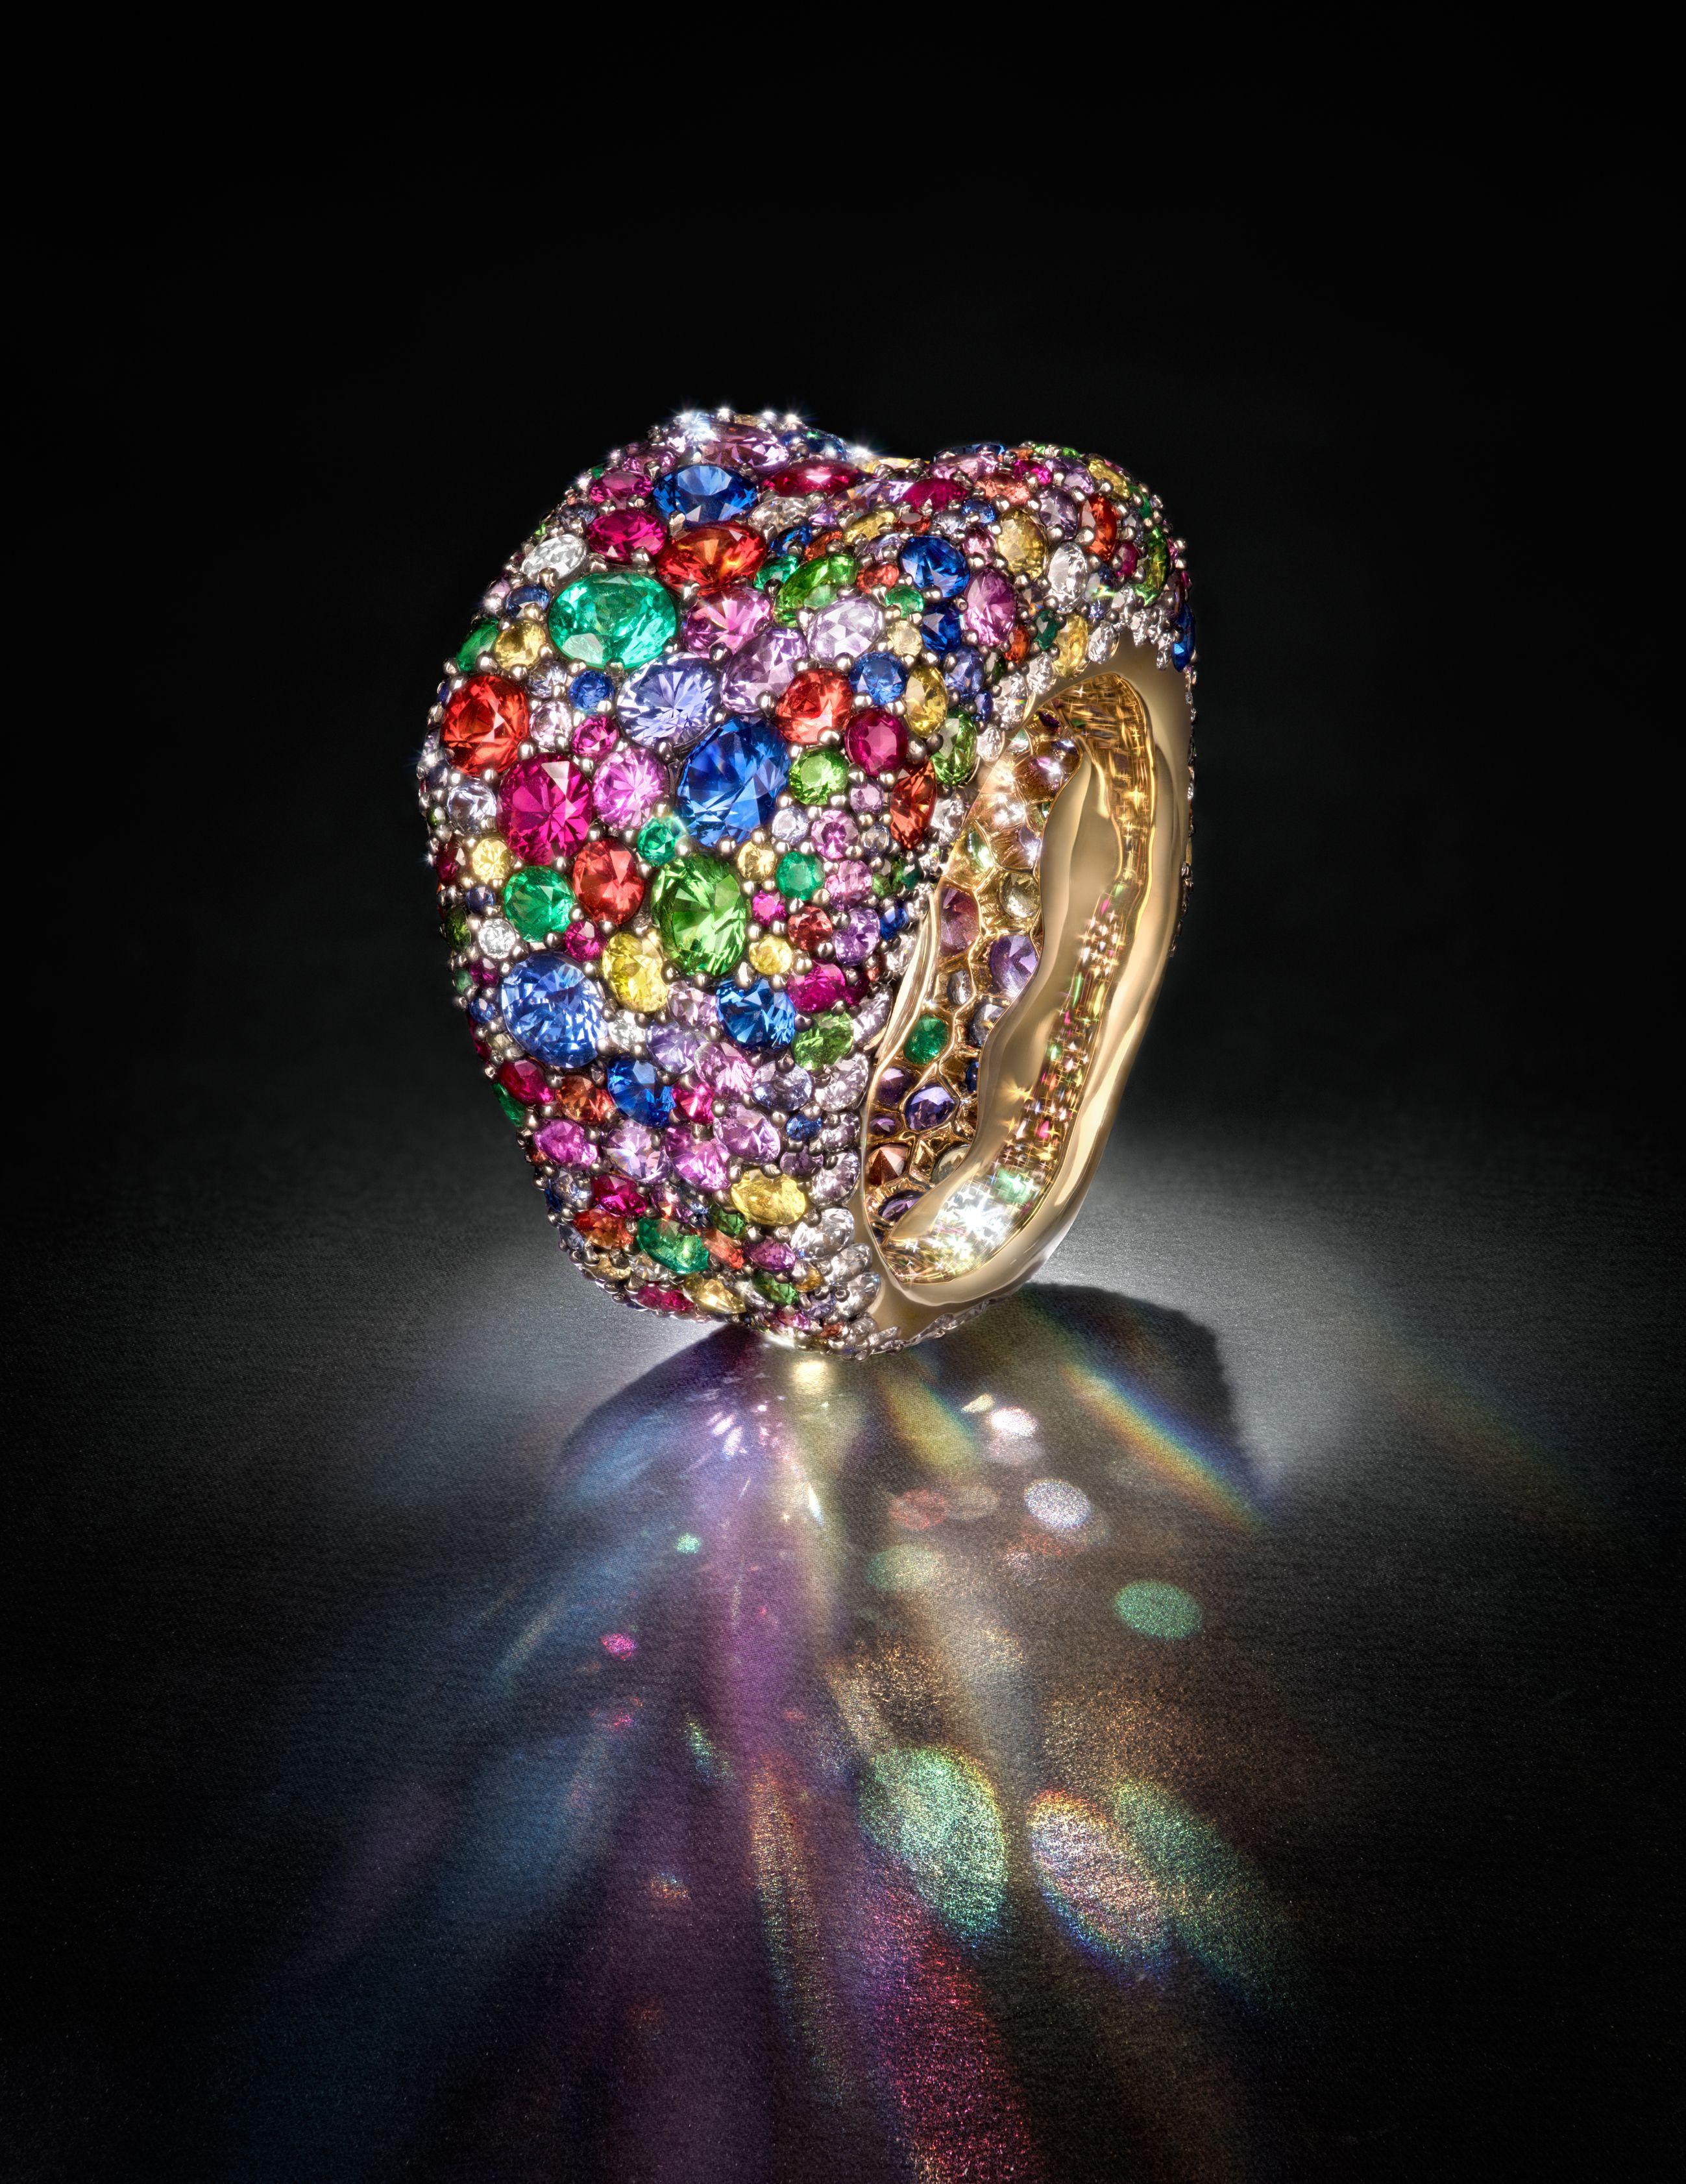 Fabergé Emotion Ring  Fabergé  Emotion  ring  gemstones   Everything ... 74b2b620c6